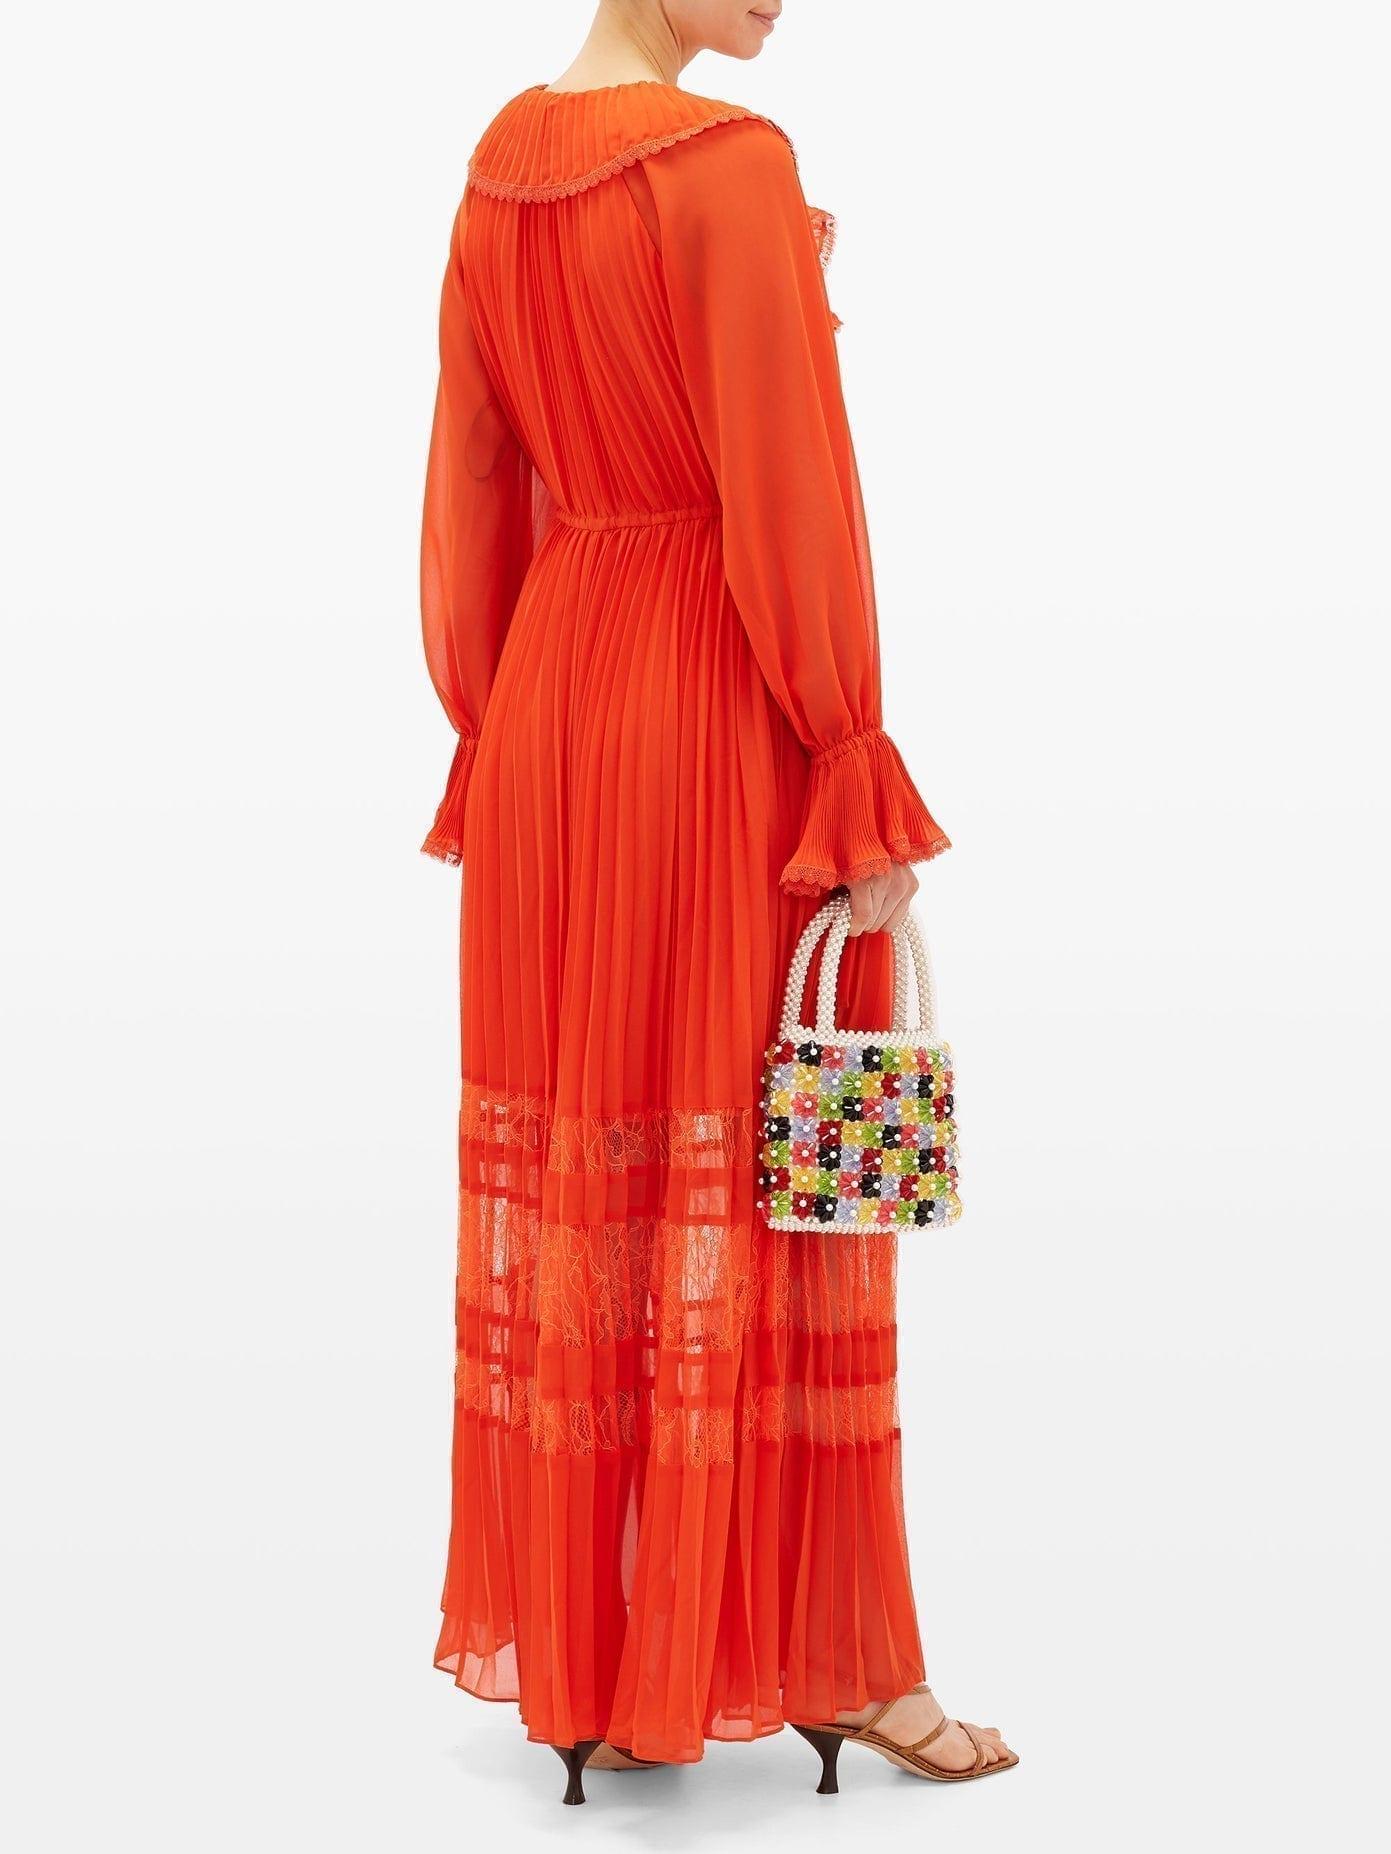 SELF-PORTRAIT Lace-trimmed Pleated Chiffon Dress